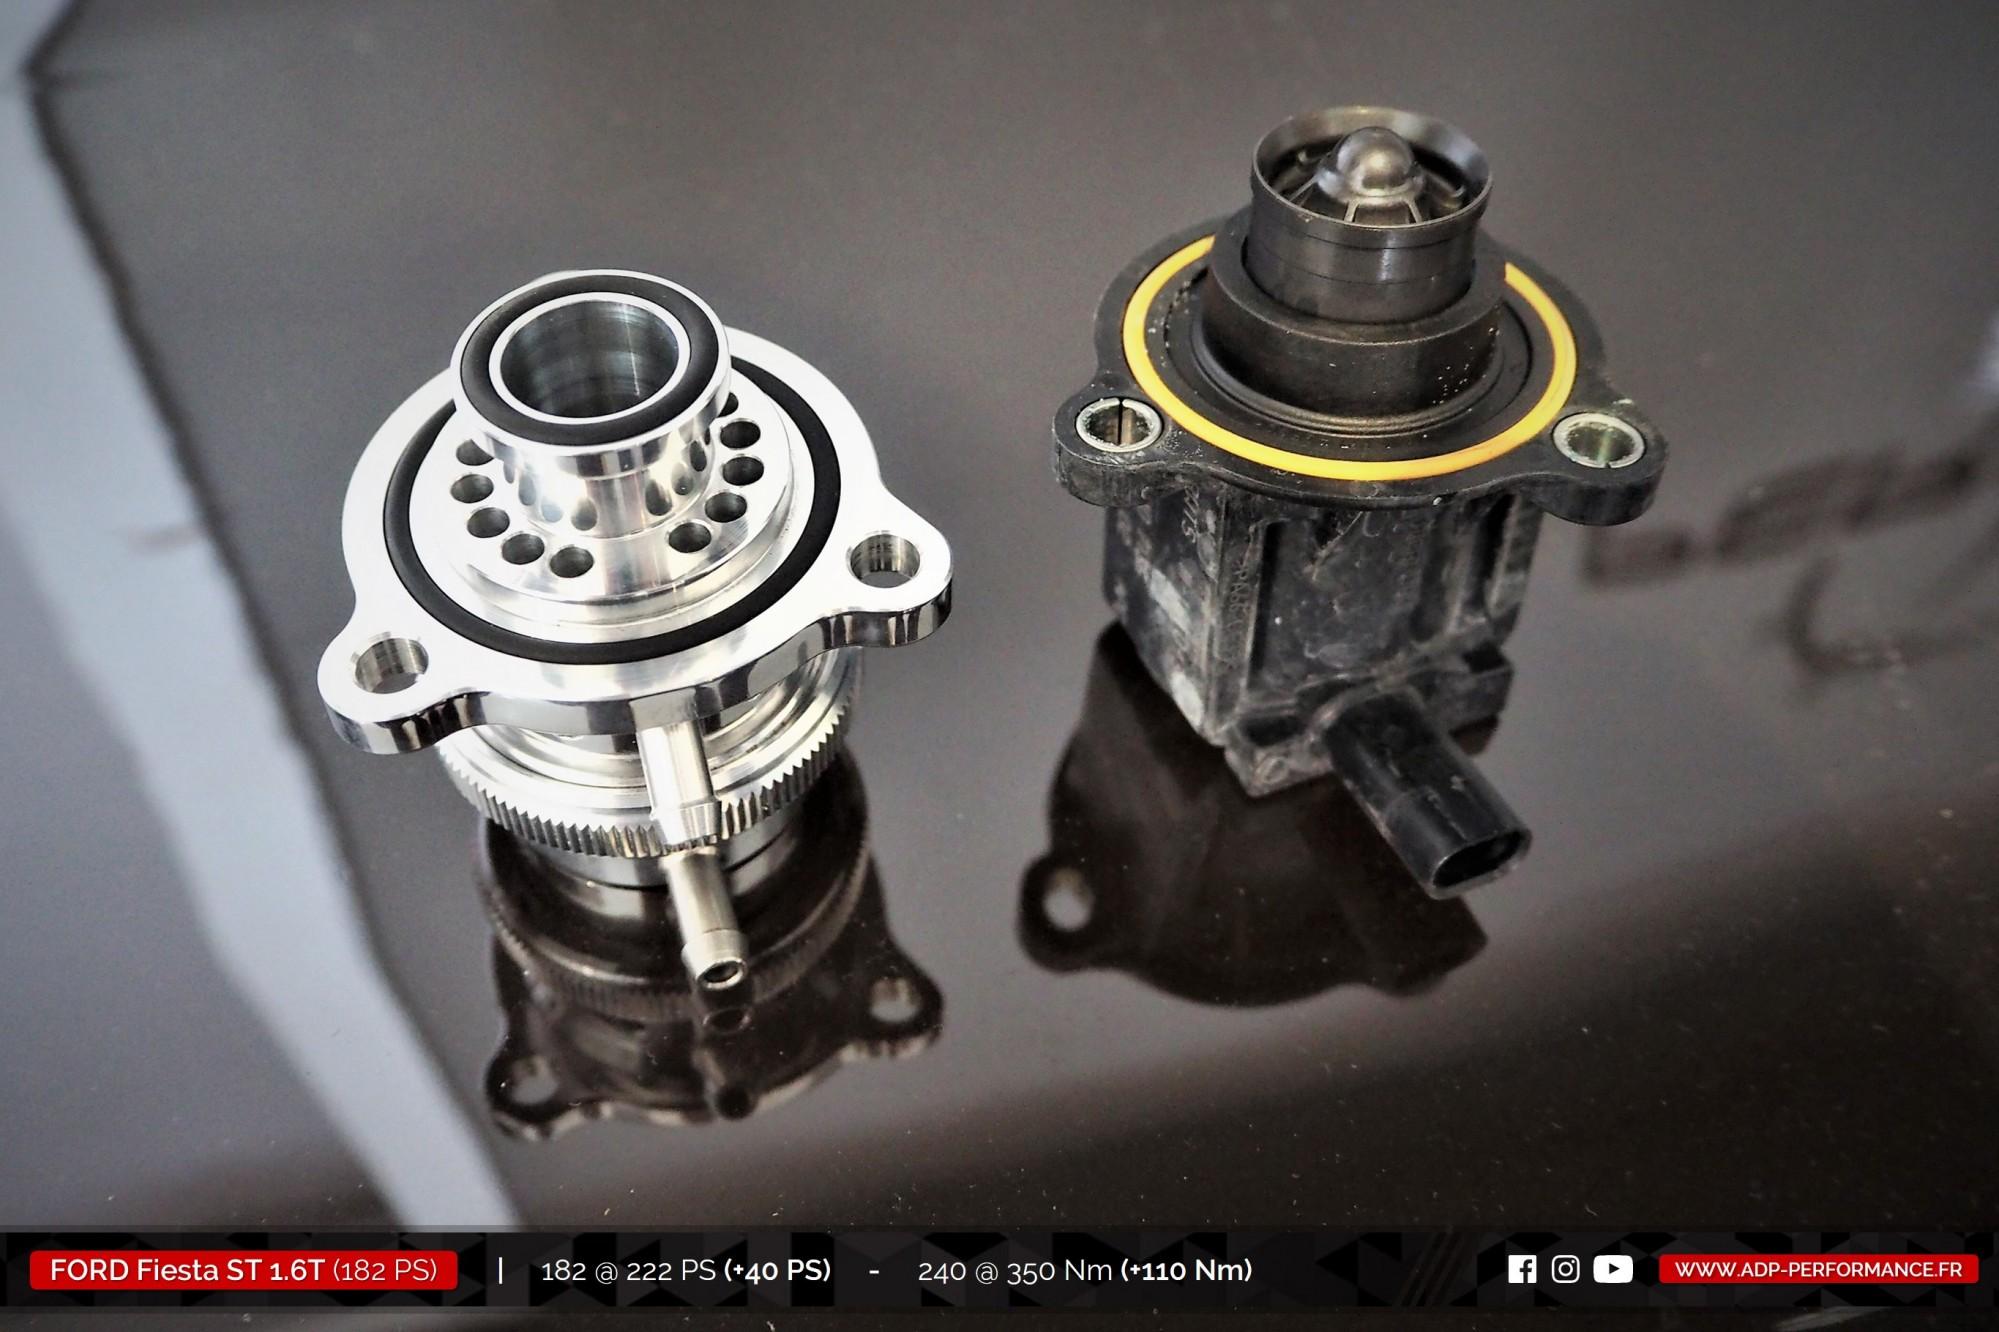 Reprogrammation moteur Avignon - Ford Fiesta ST 1.6T 182cv- ADP Performance